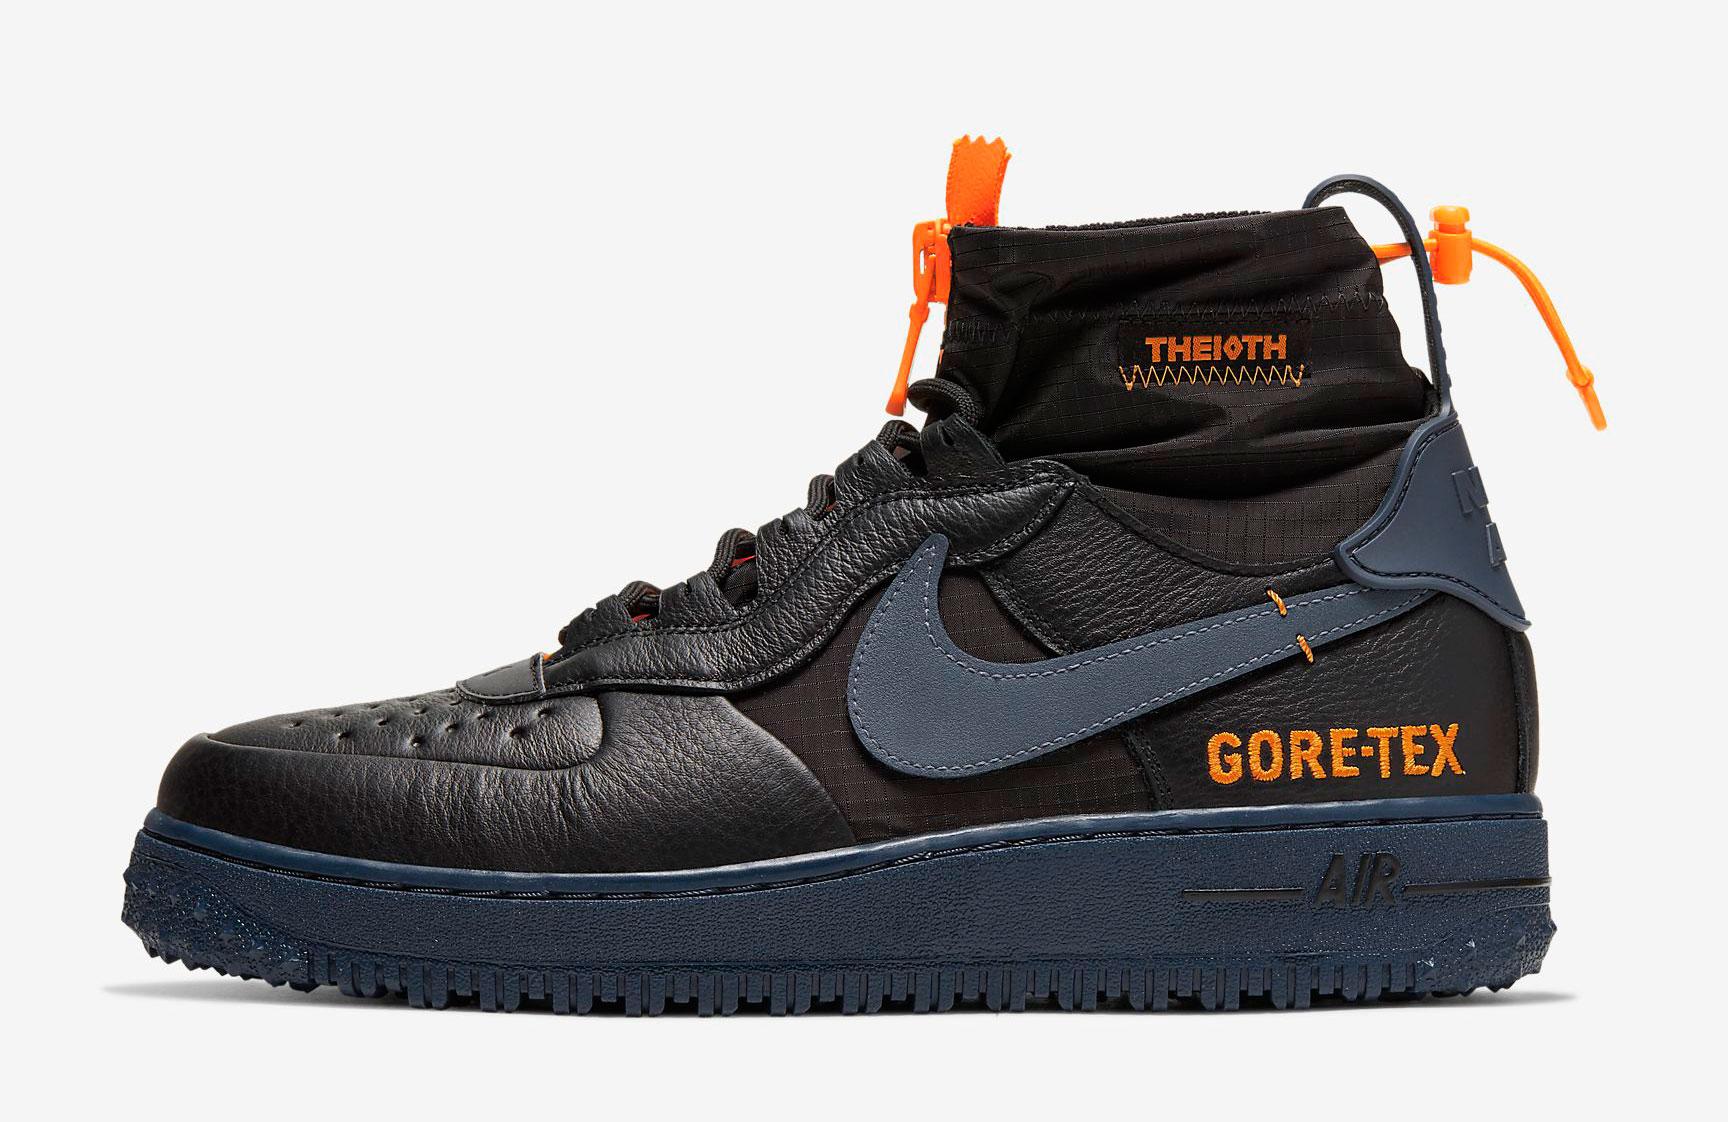 nike-air-force-1-winter-goretex-boot-black-ceramic-release-date